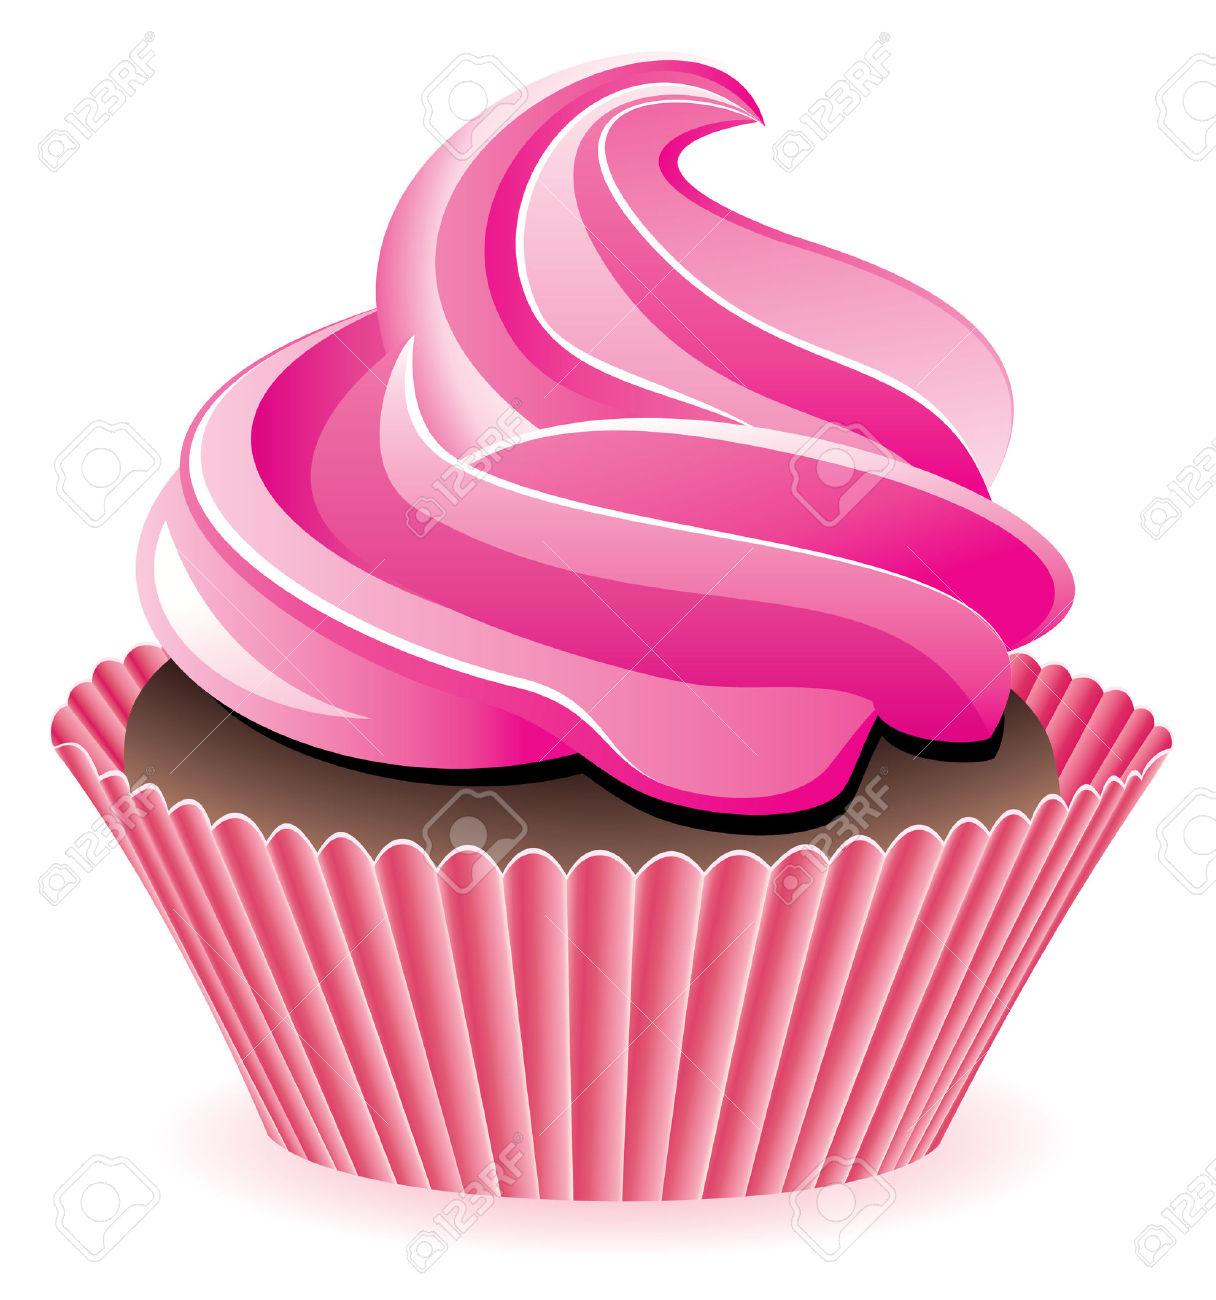 Light pink cupcake clipart